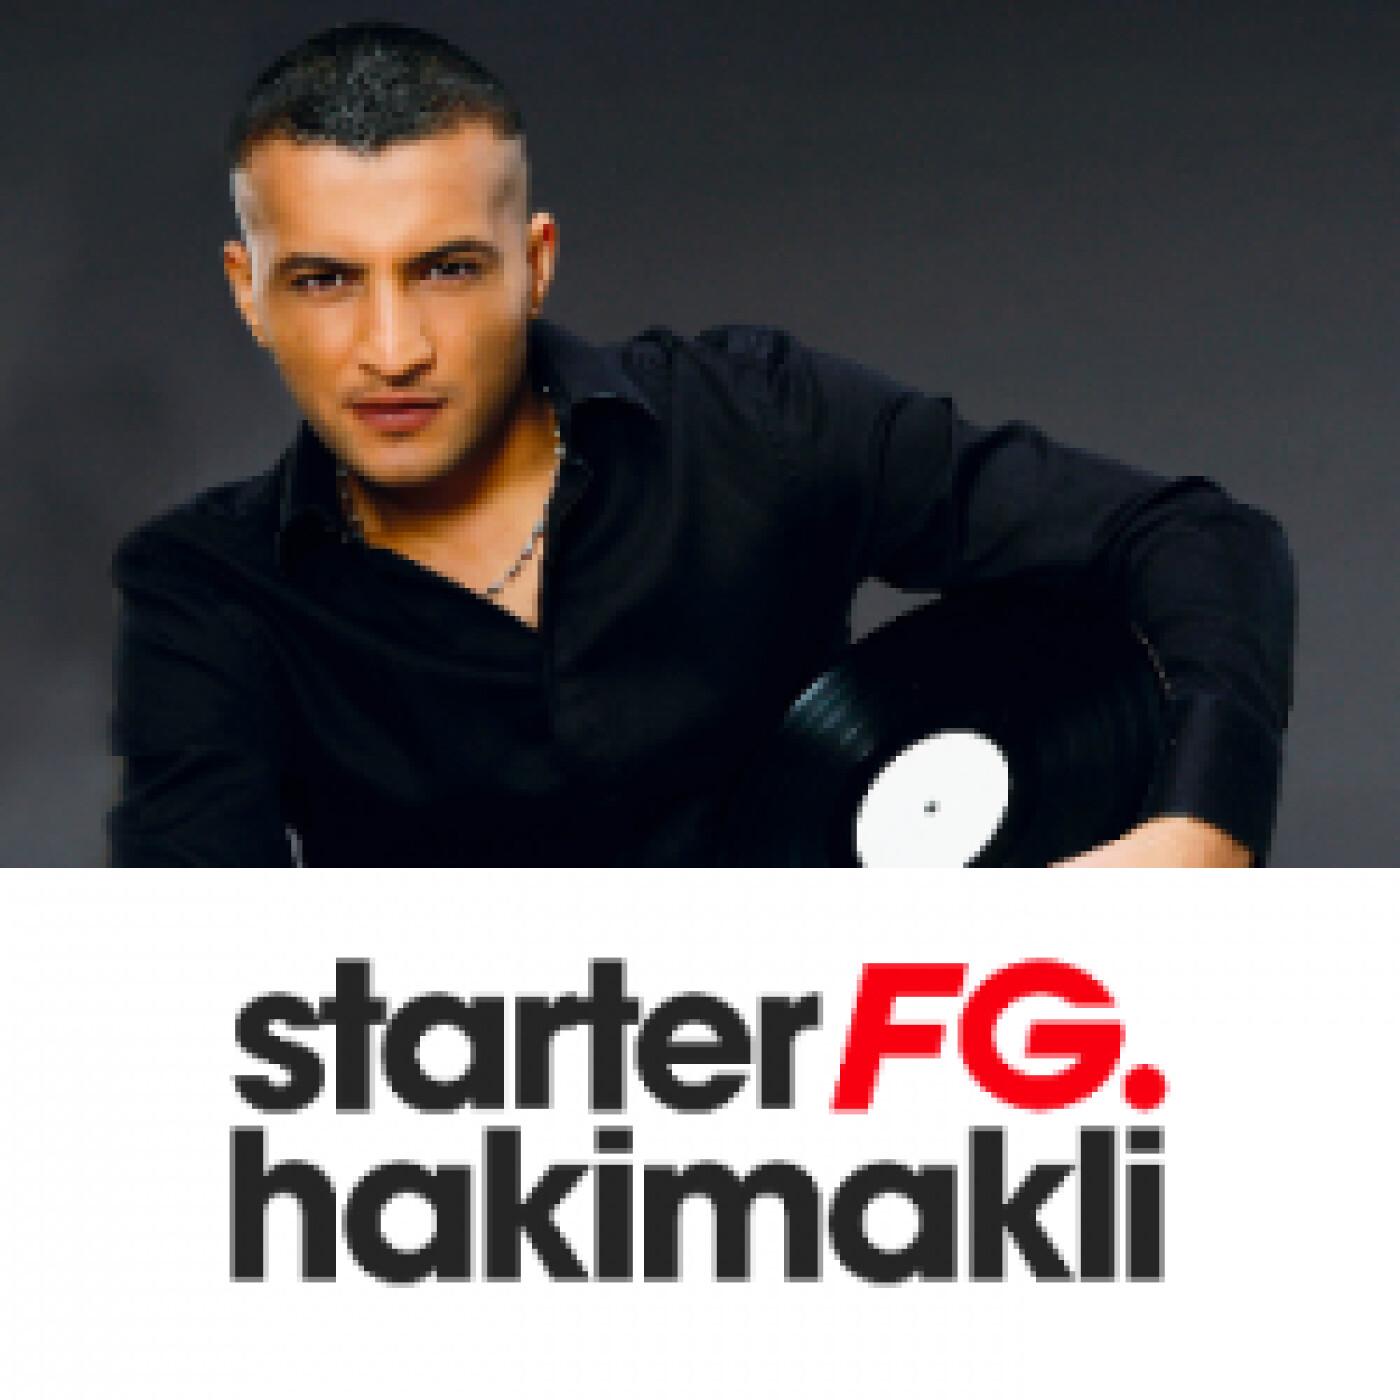 STARTER FG BY HAKIMAKLI LUNDI 25 JANVIER 2021